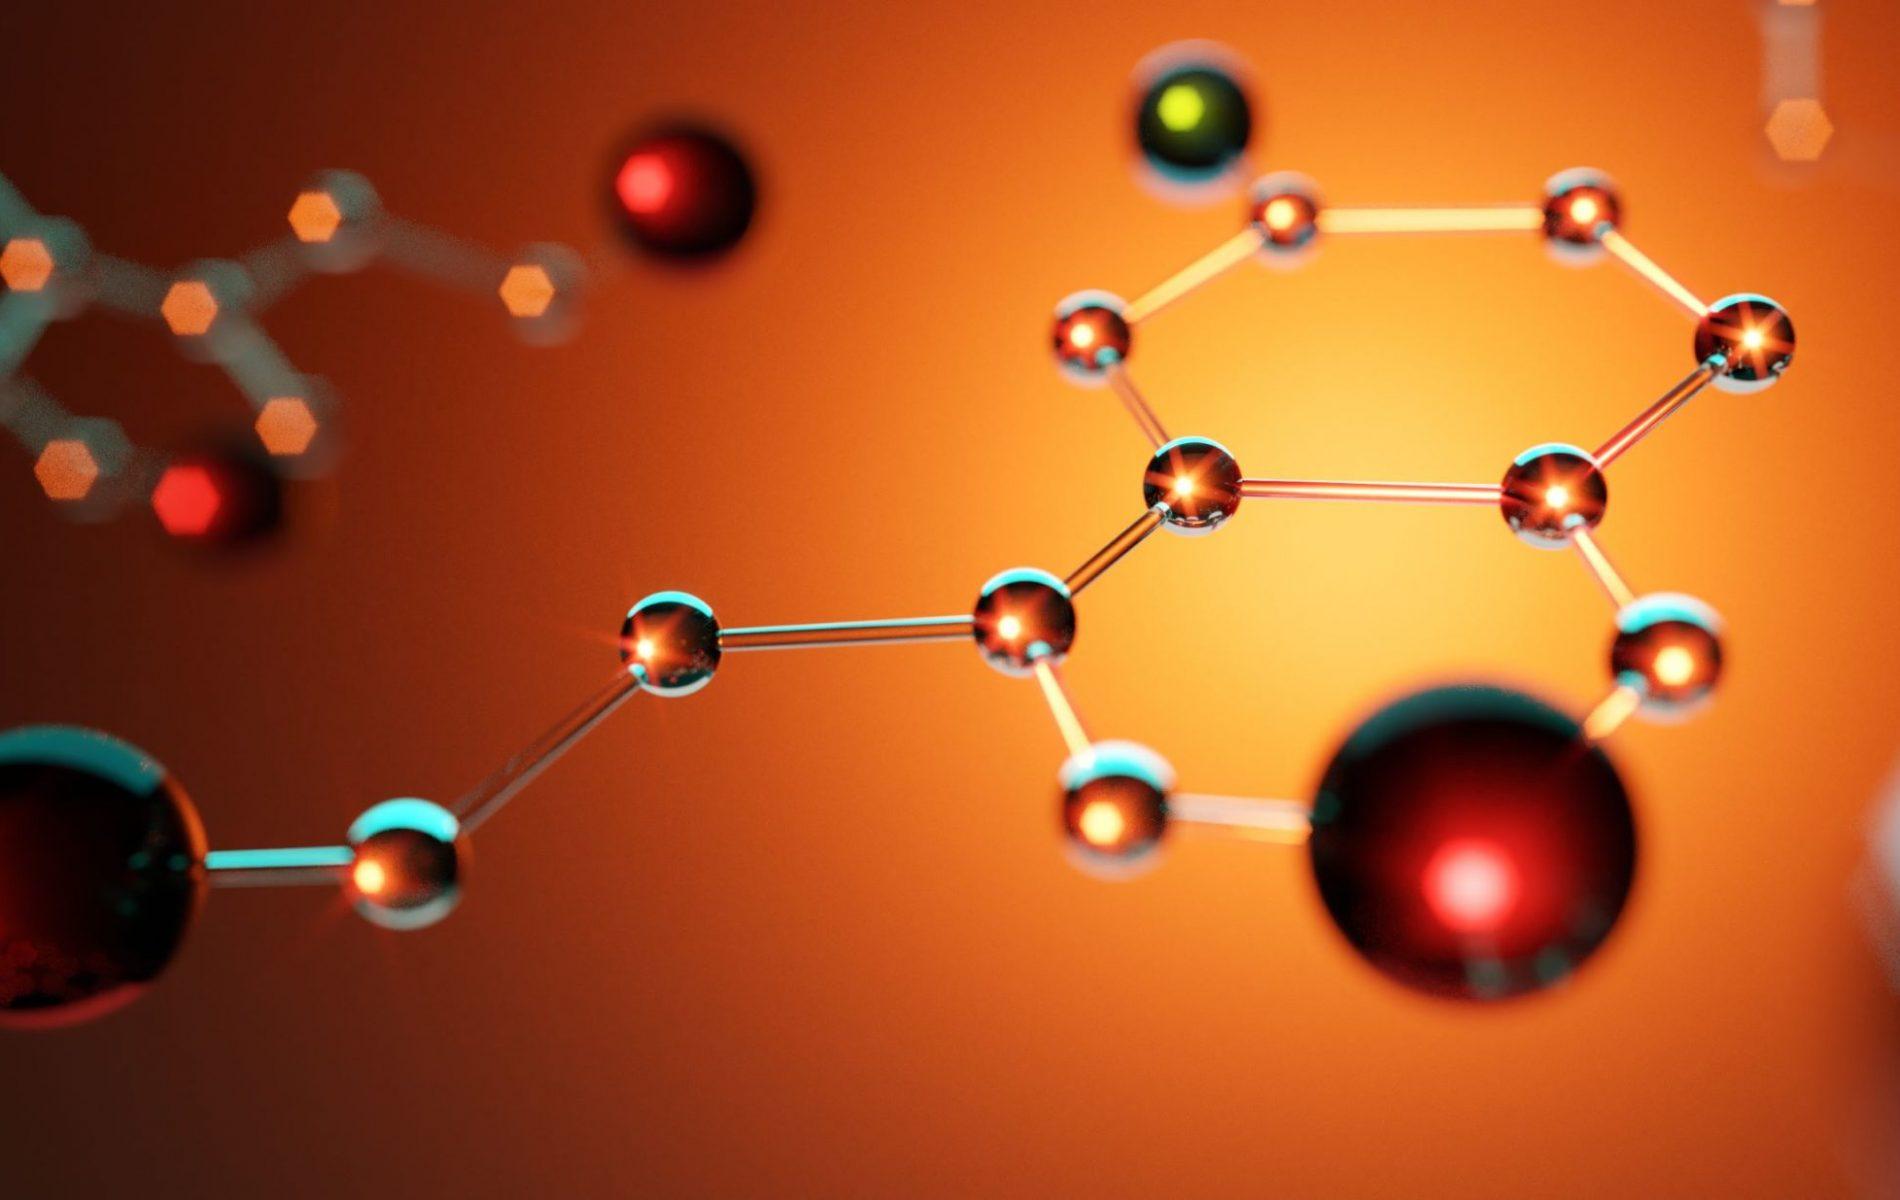 serotonin molecules